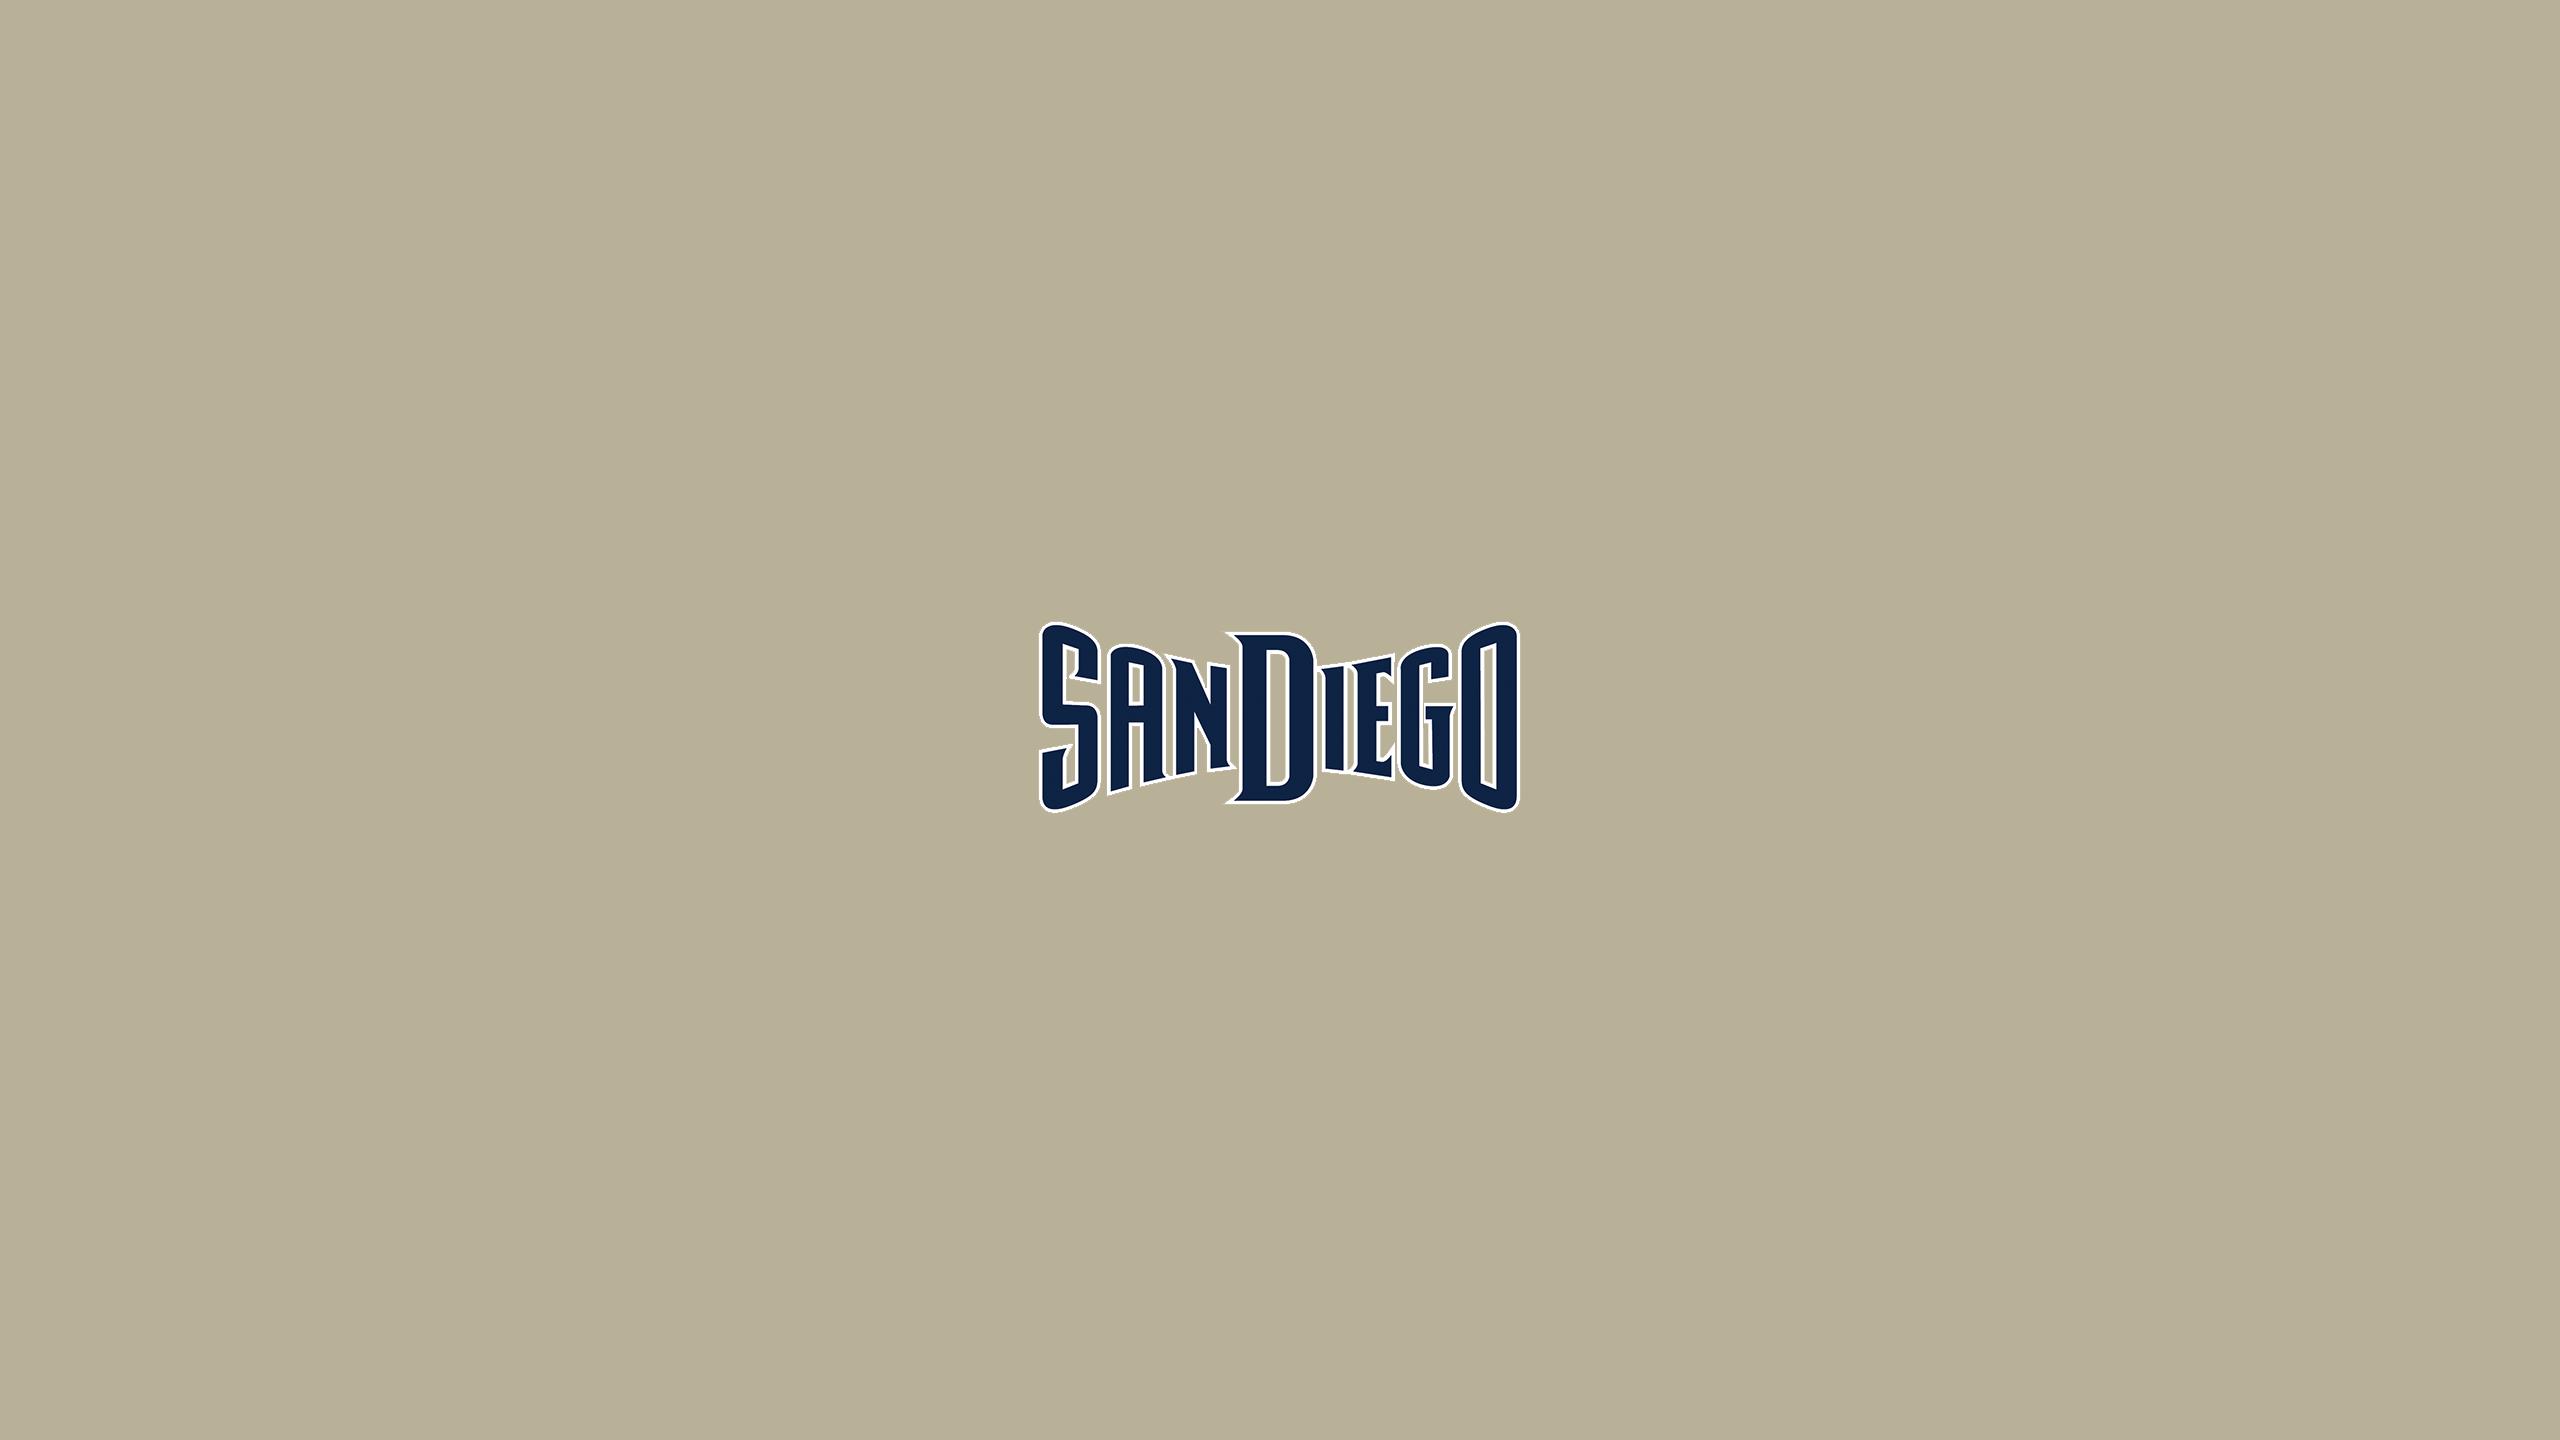 San Diego Padres (Away)